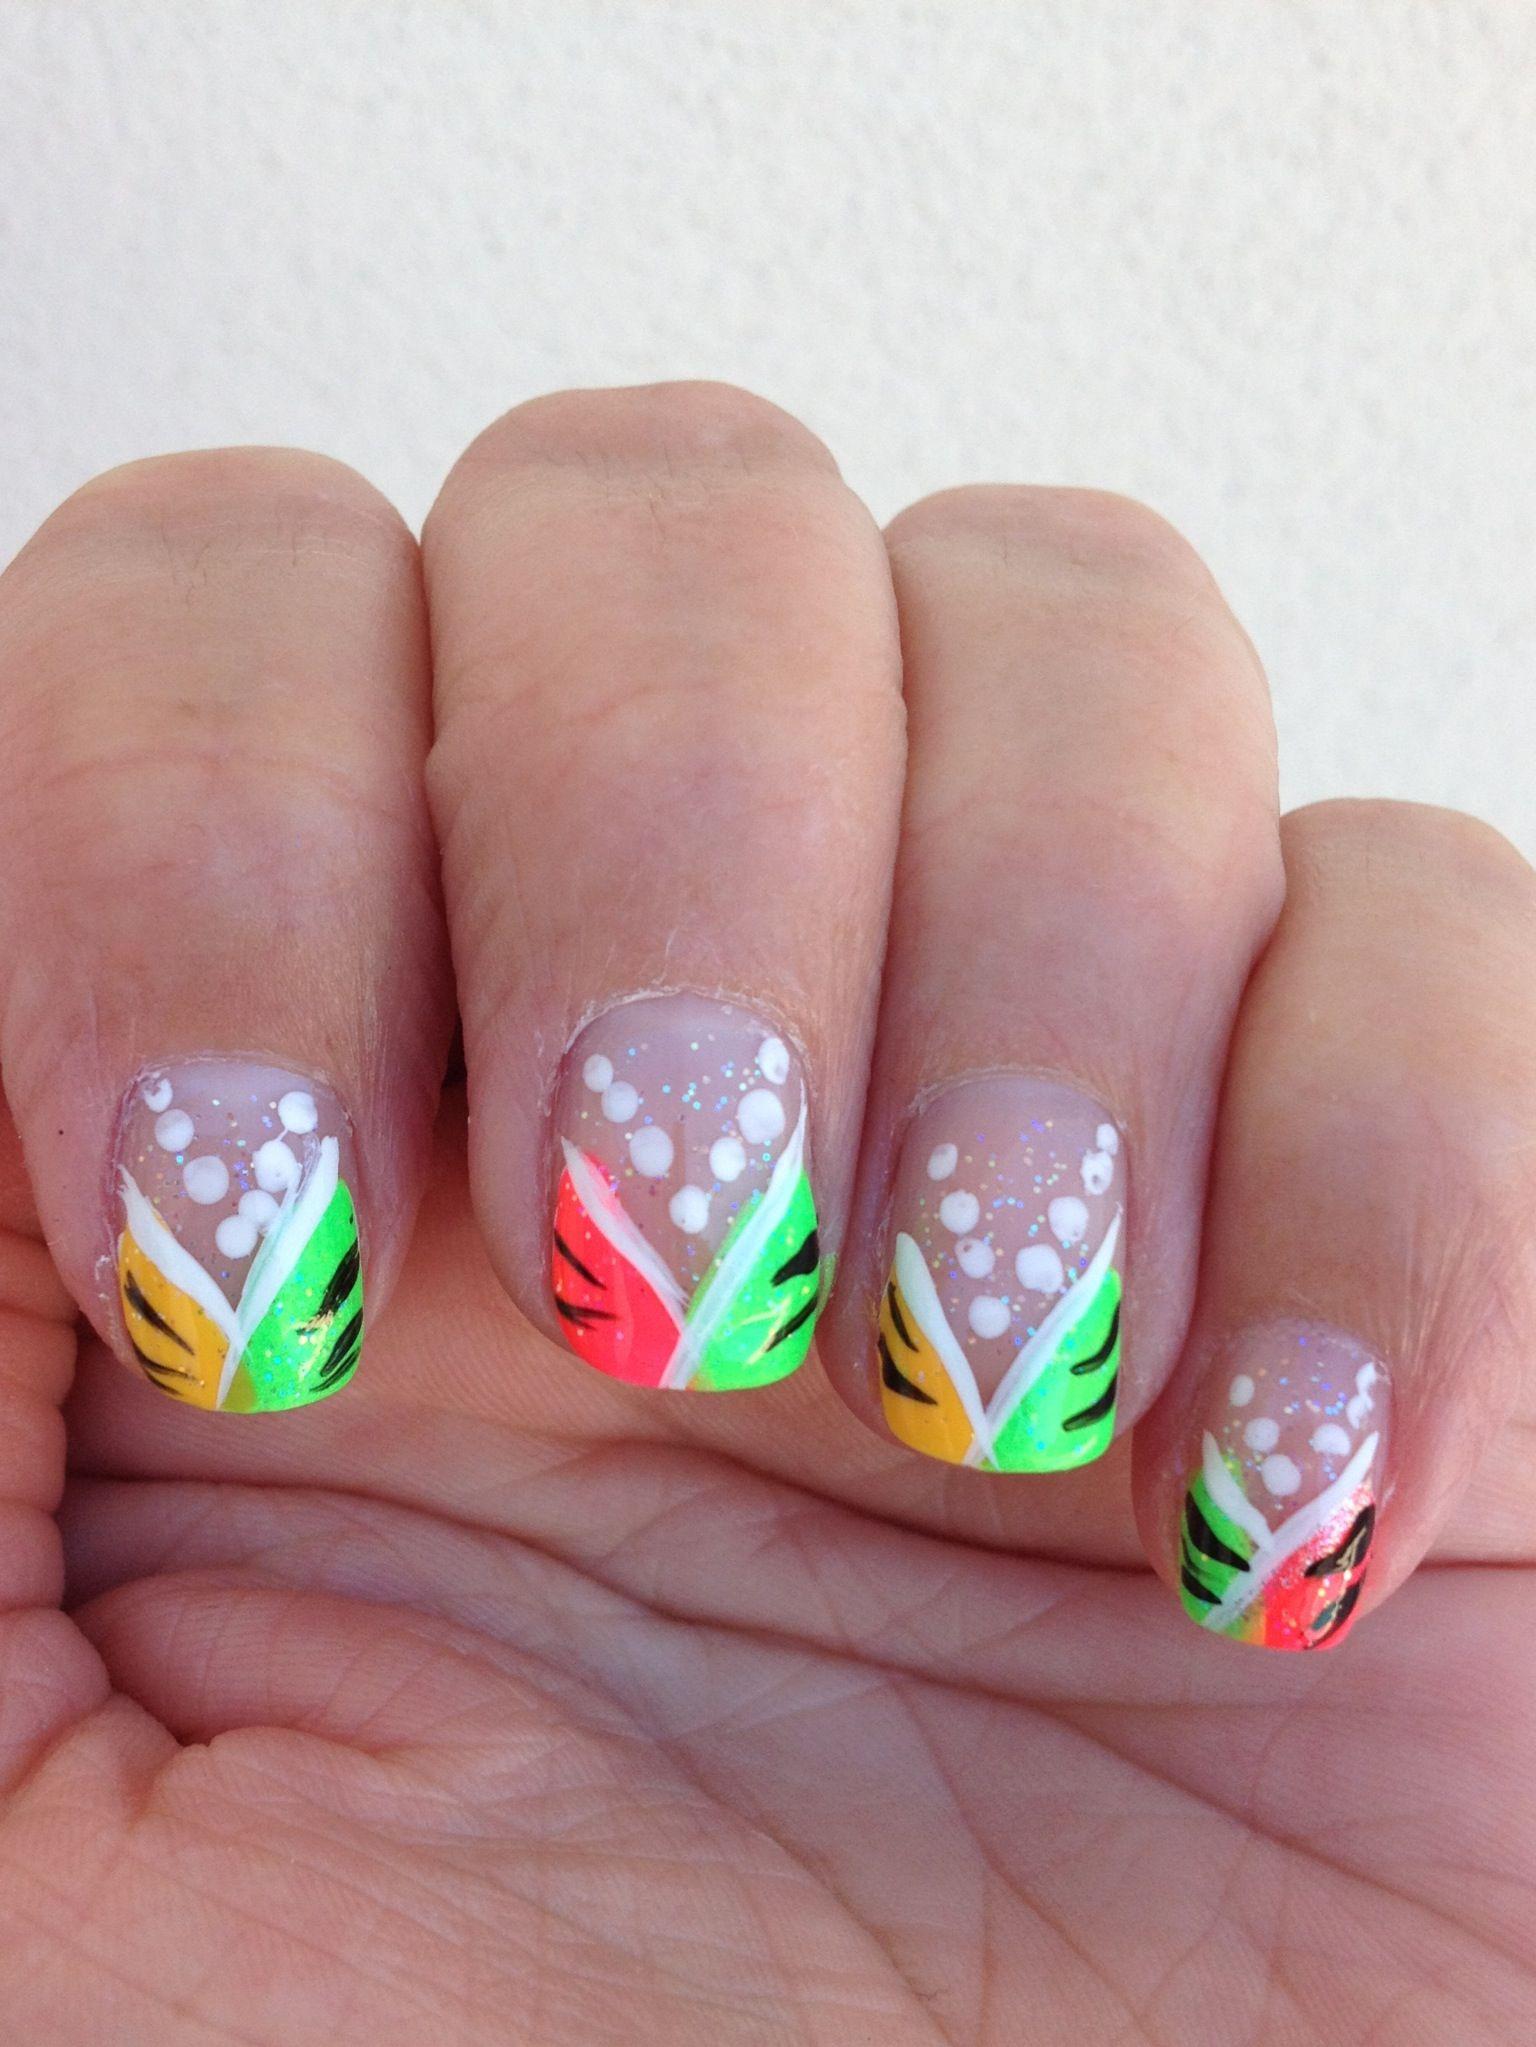 Easy summer neon nails   Nail Art   Pinterest   Neon nails and Makeup